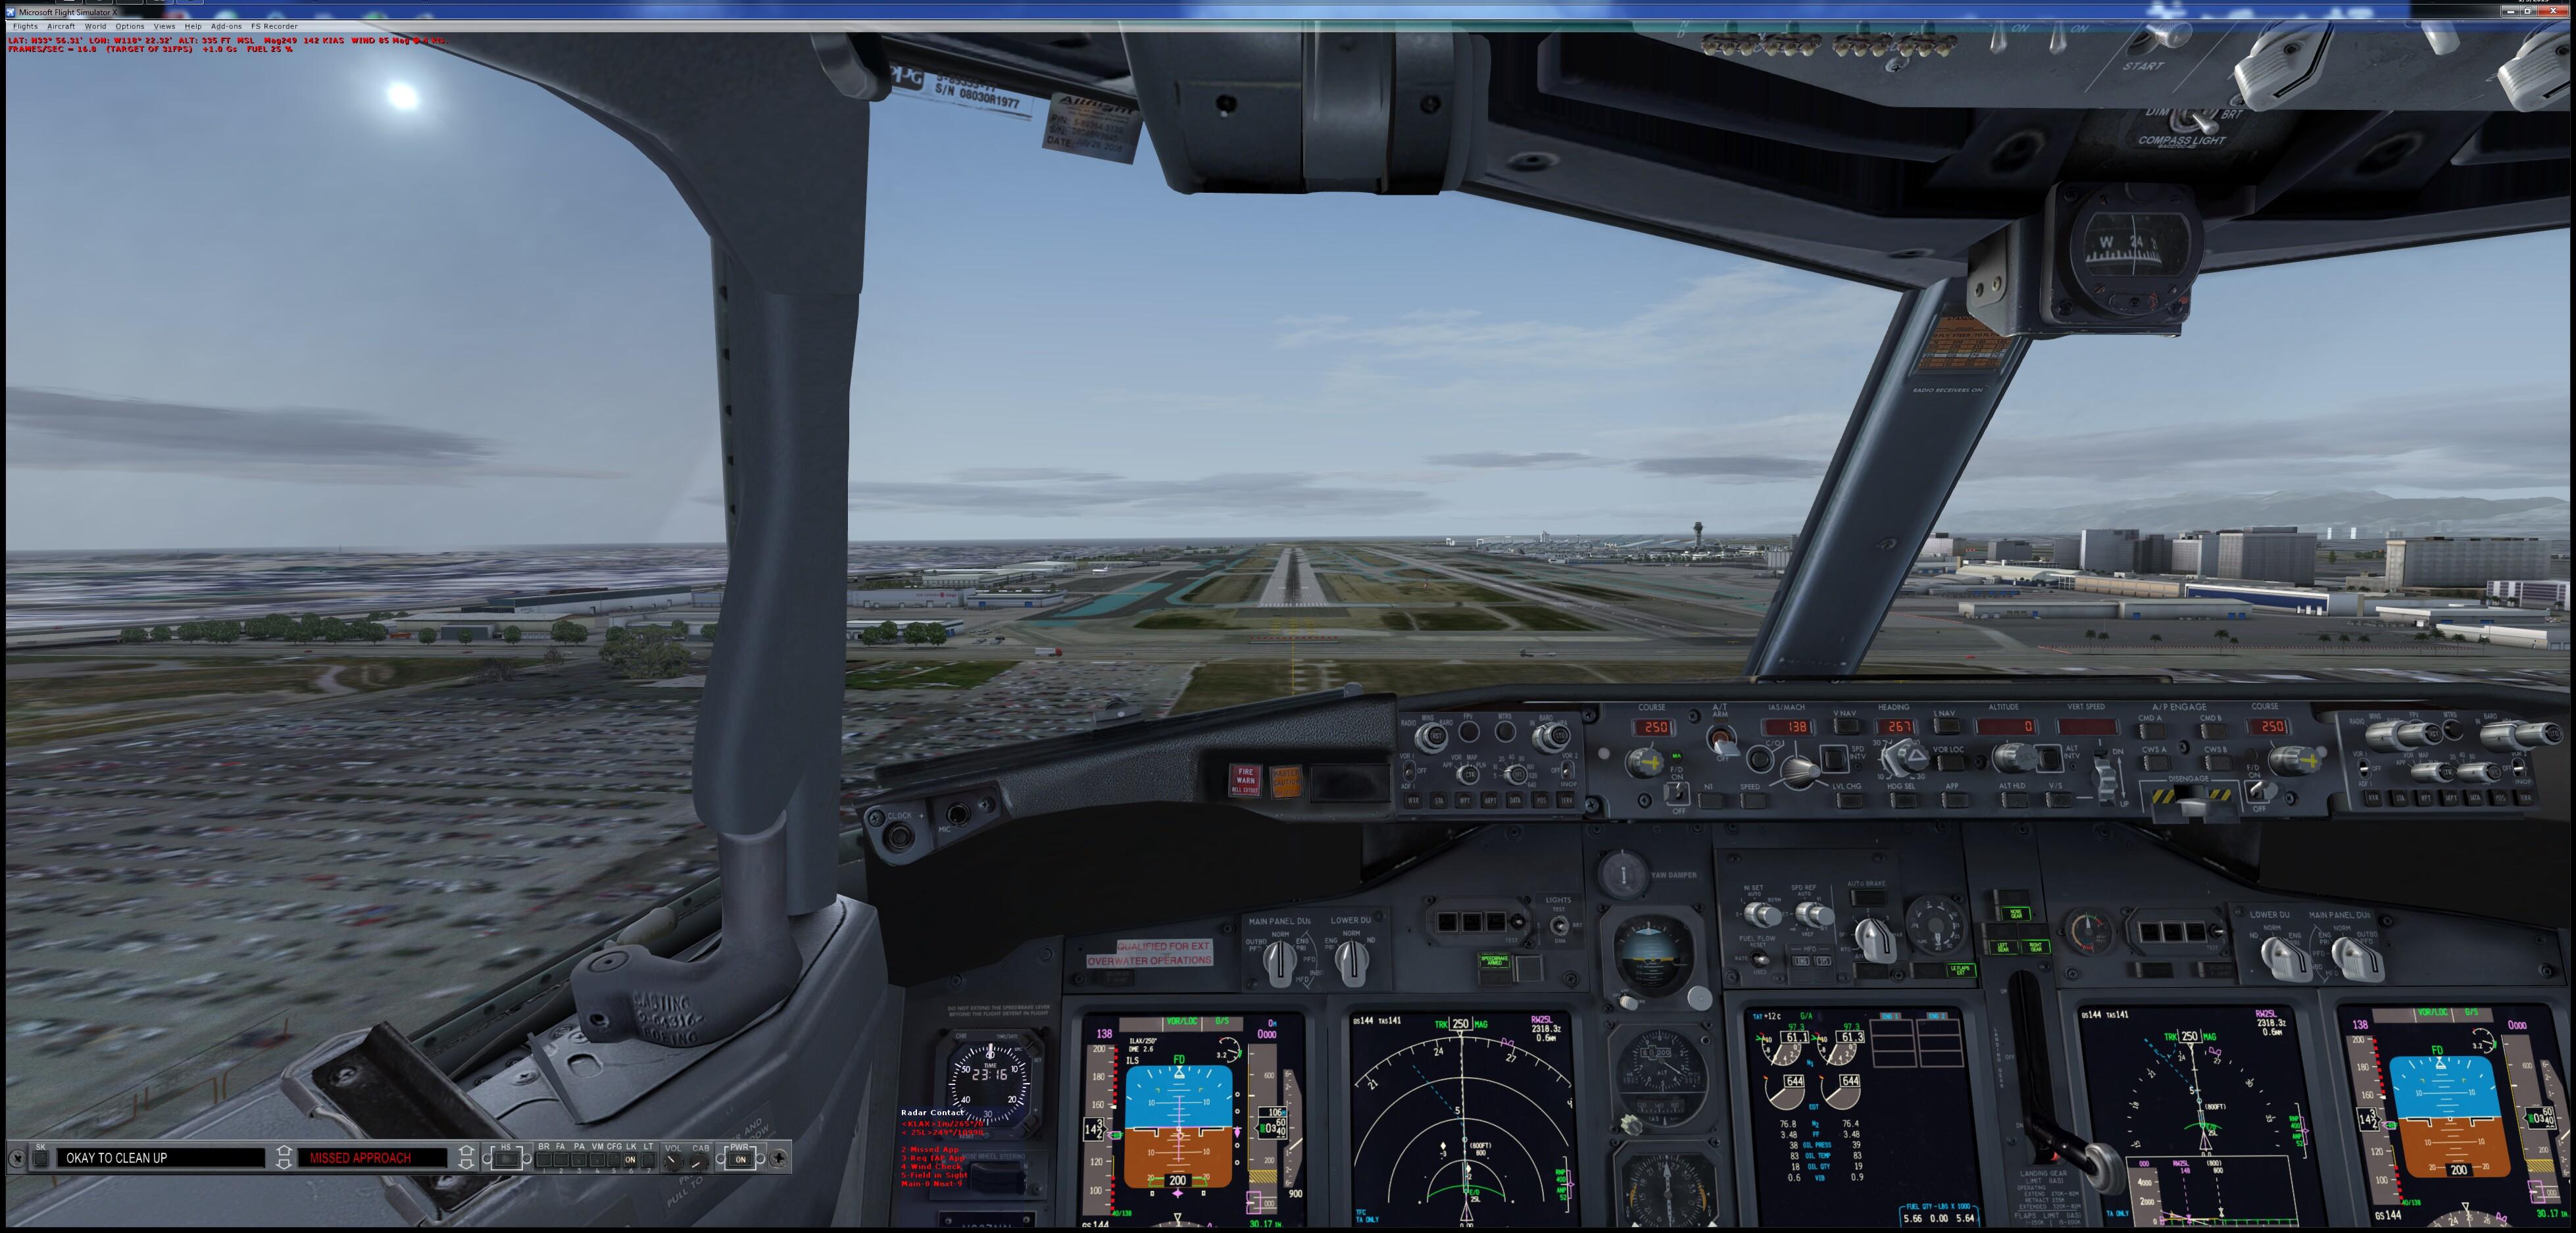 ScreenshotsKSAN-KLAX-01-24.jpg